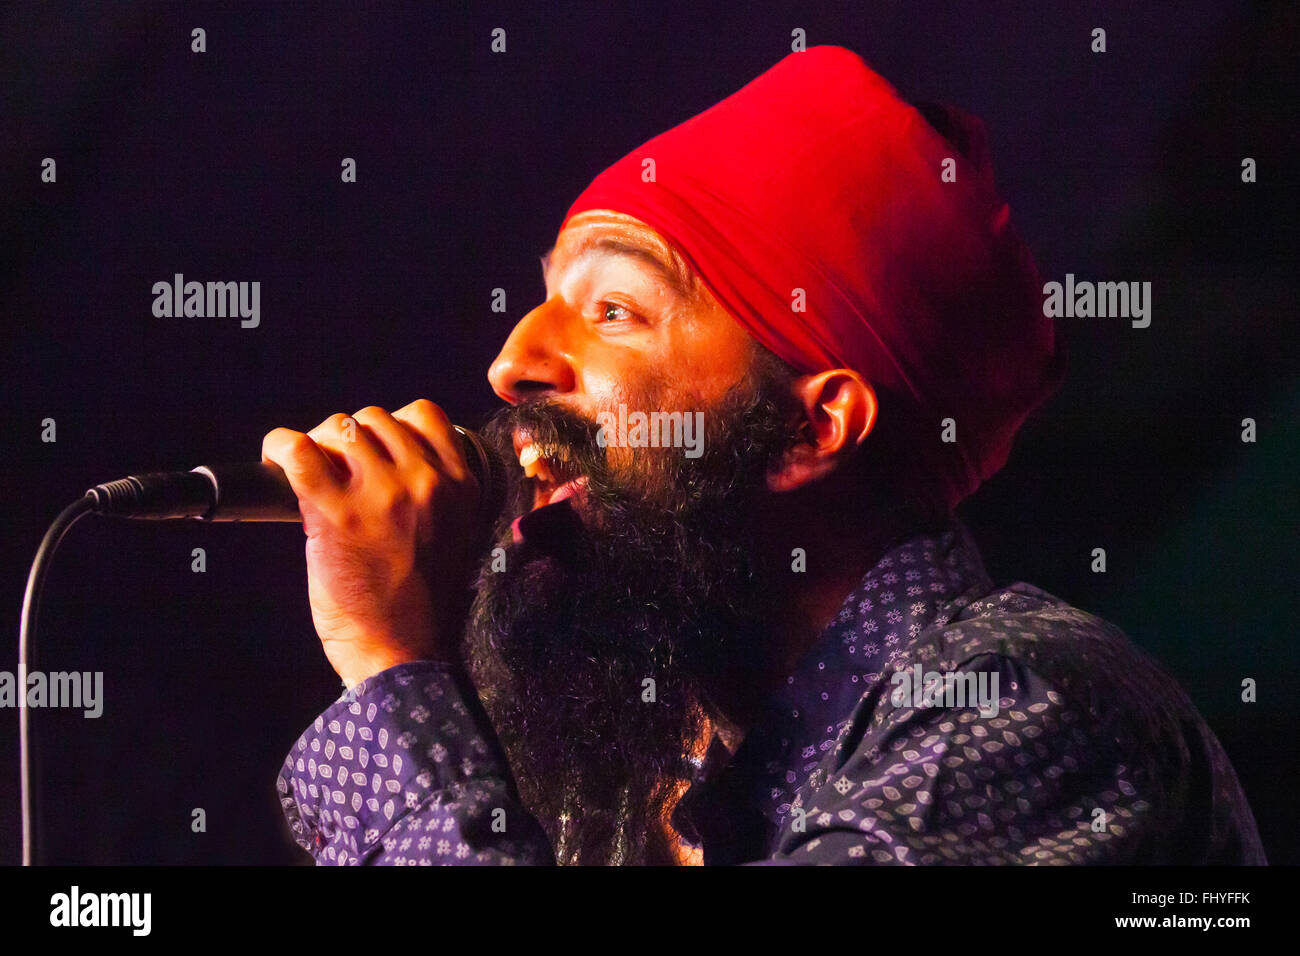 SONNY SINGH sings for RED BARAAT in Dizzys Den at the MONTEREY JAZZ FESTIVAL - Stock Image